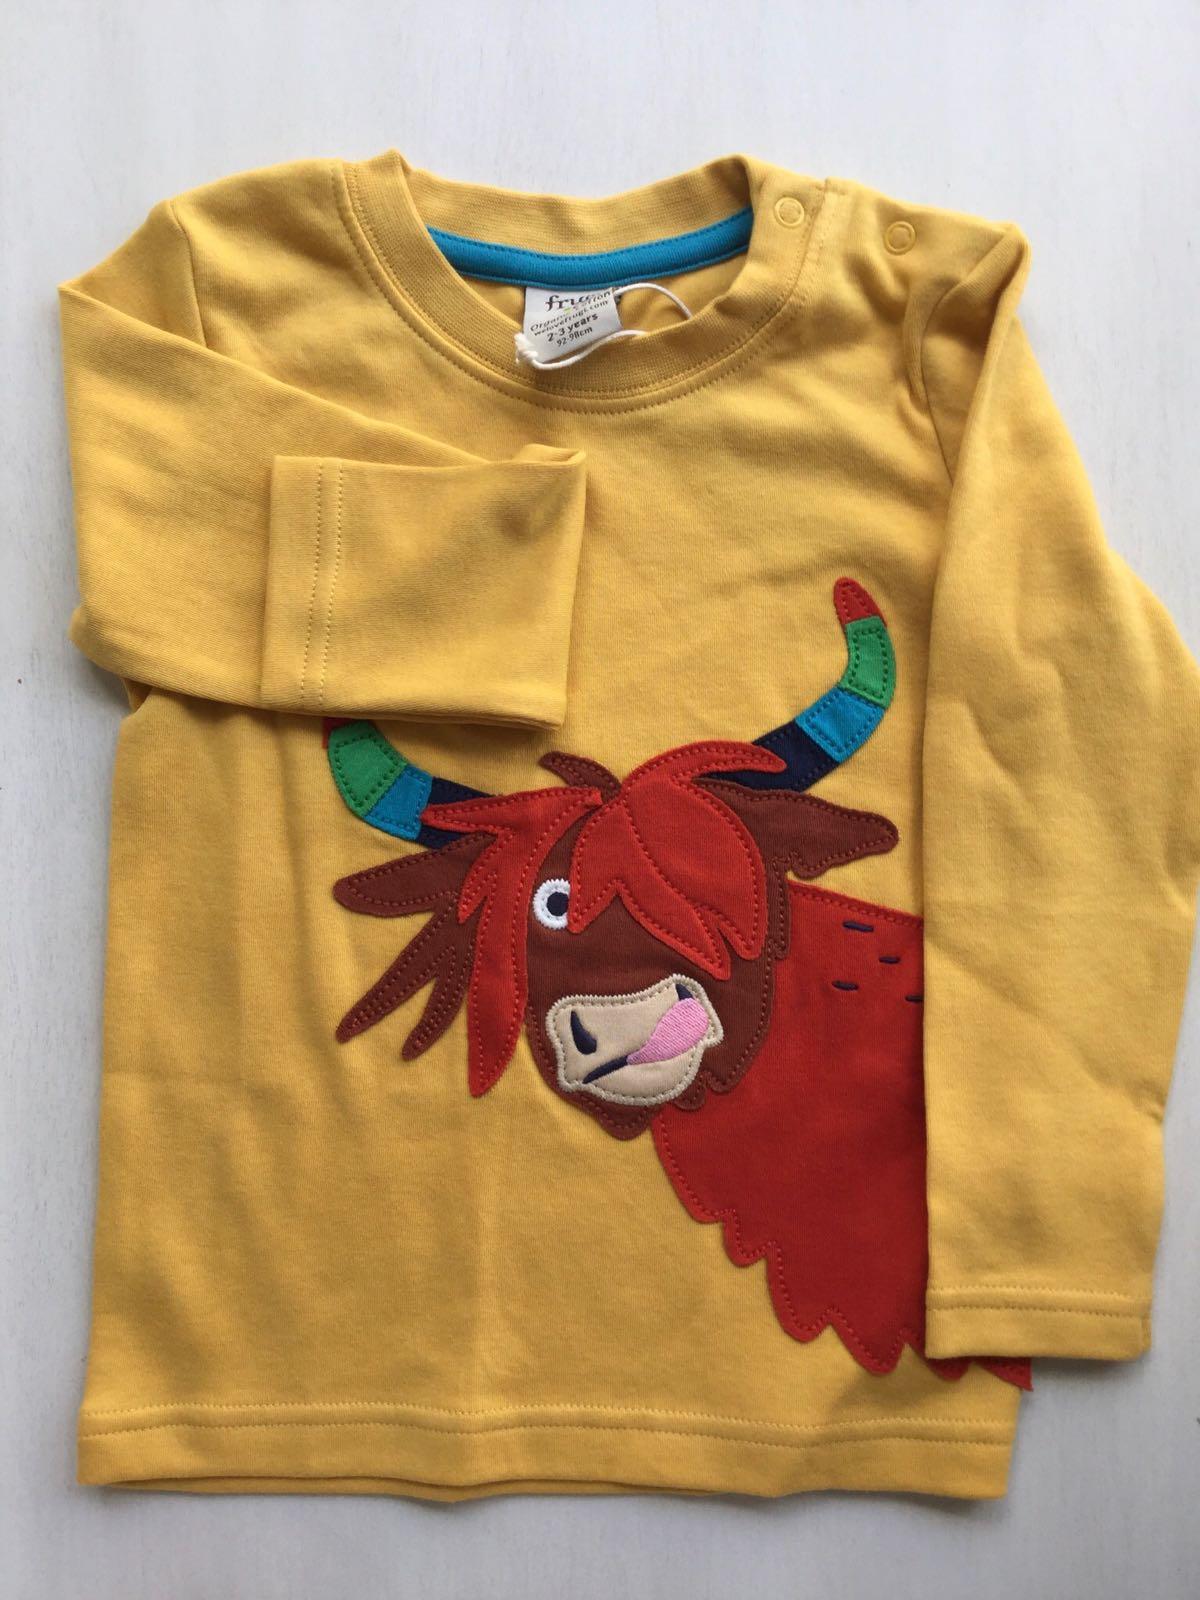 Frugi - Adventure appliqué top - Bumble bee/ cow